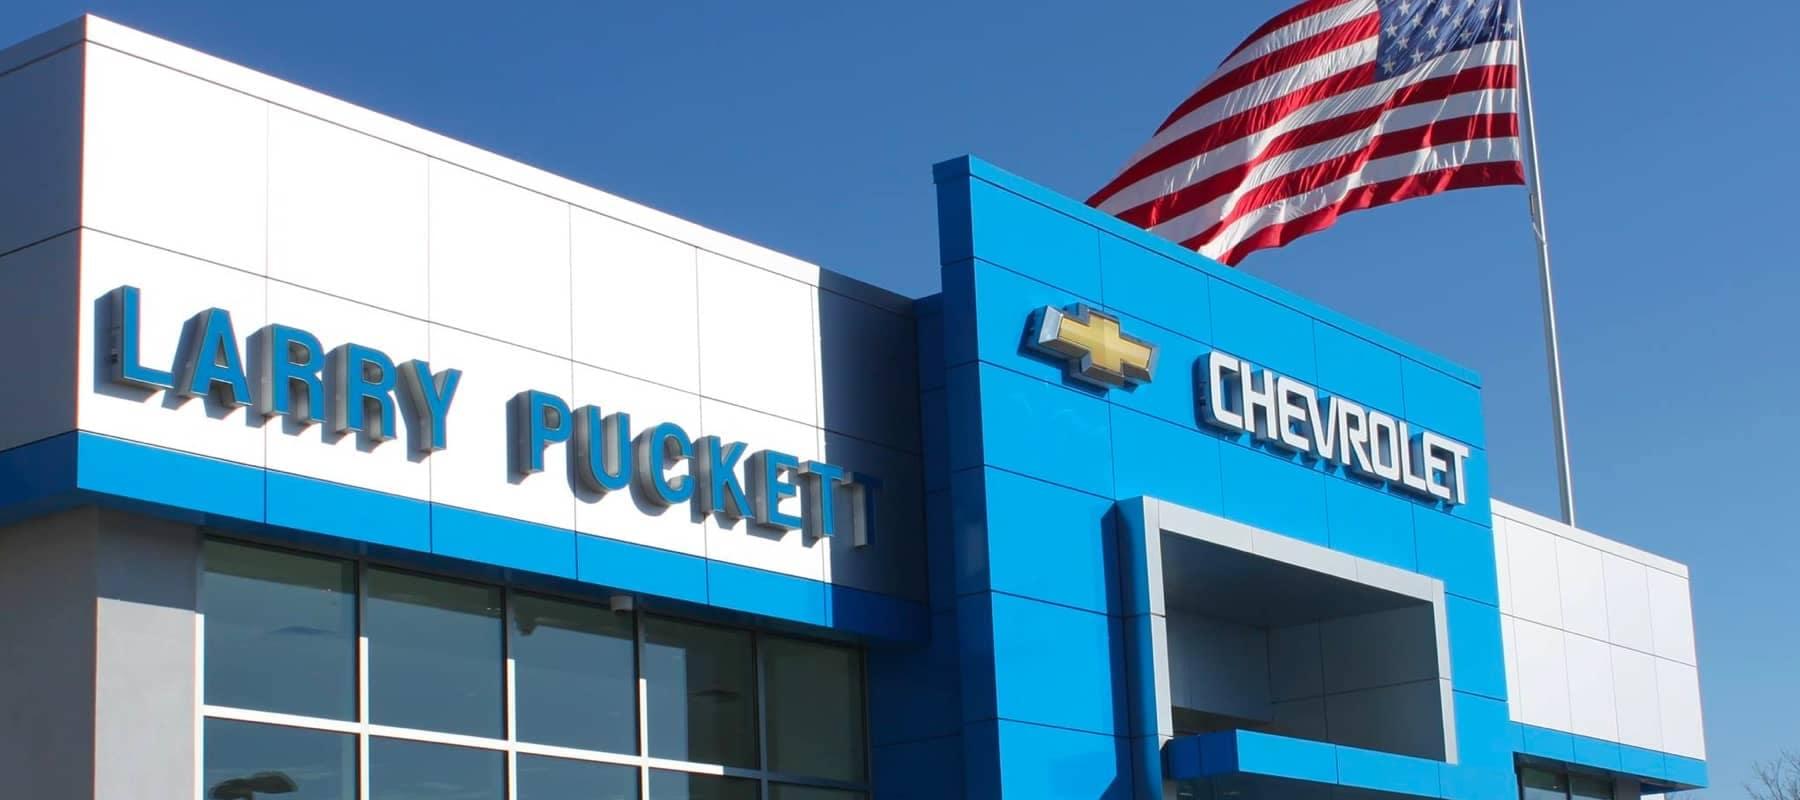 Larry Puckett Chevrolet outside of the dealership